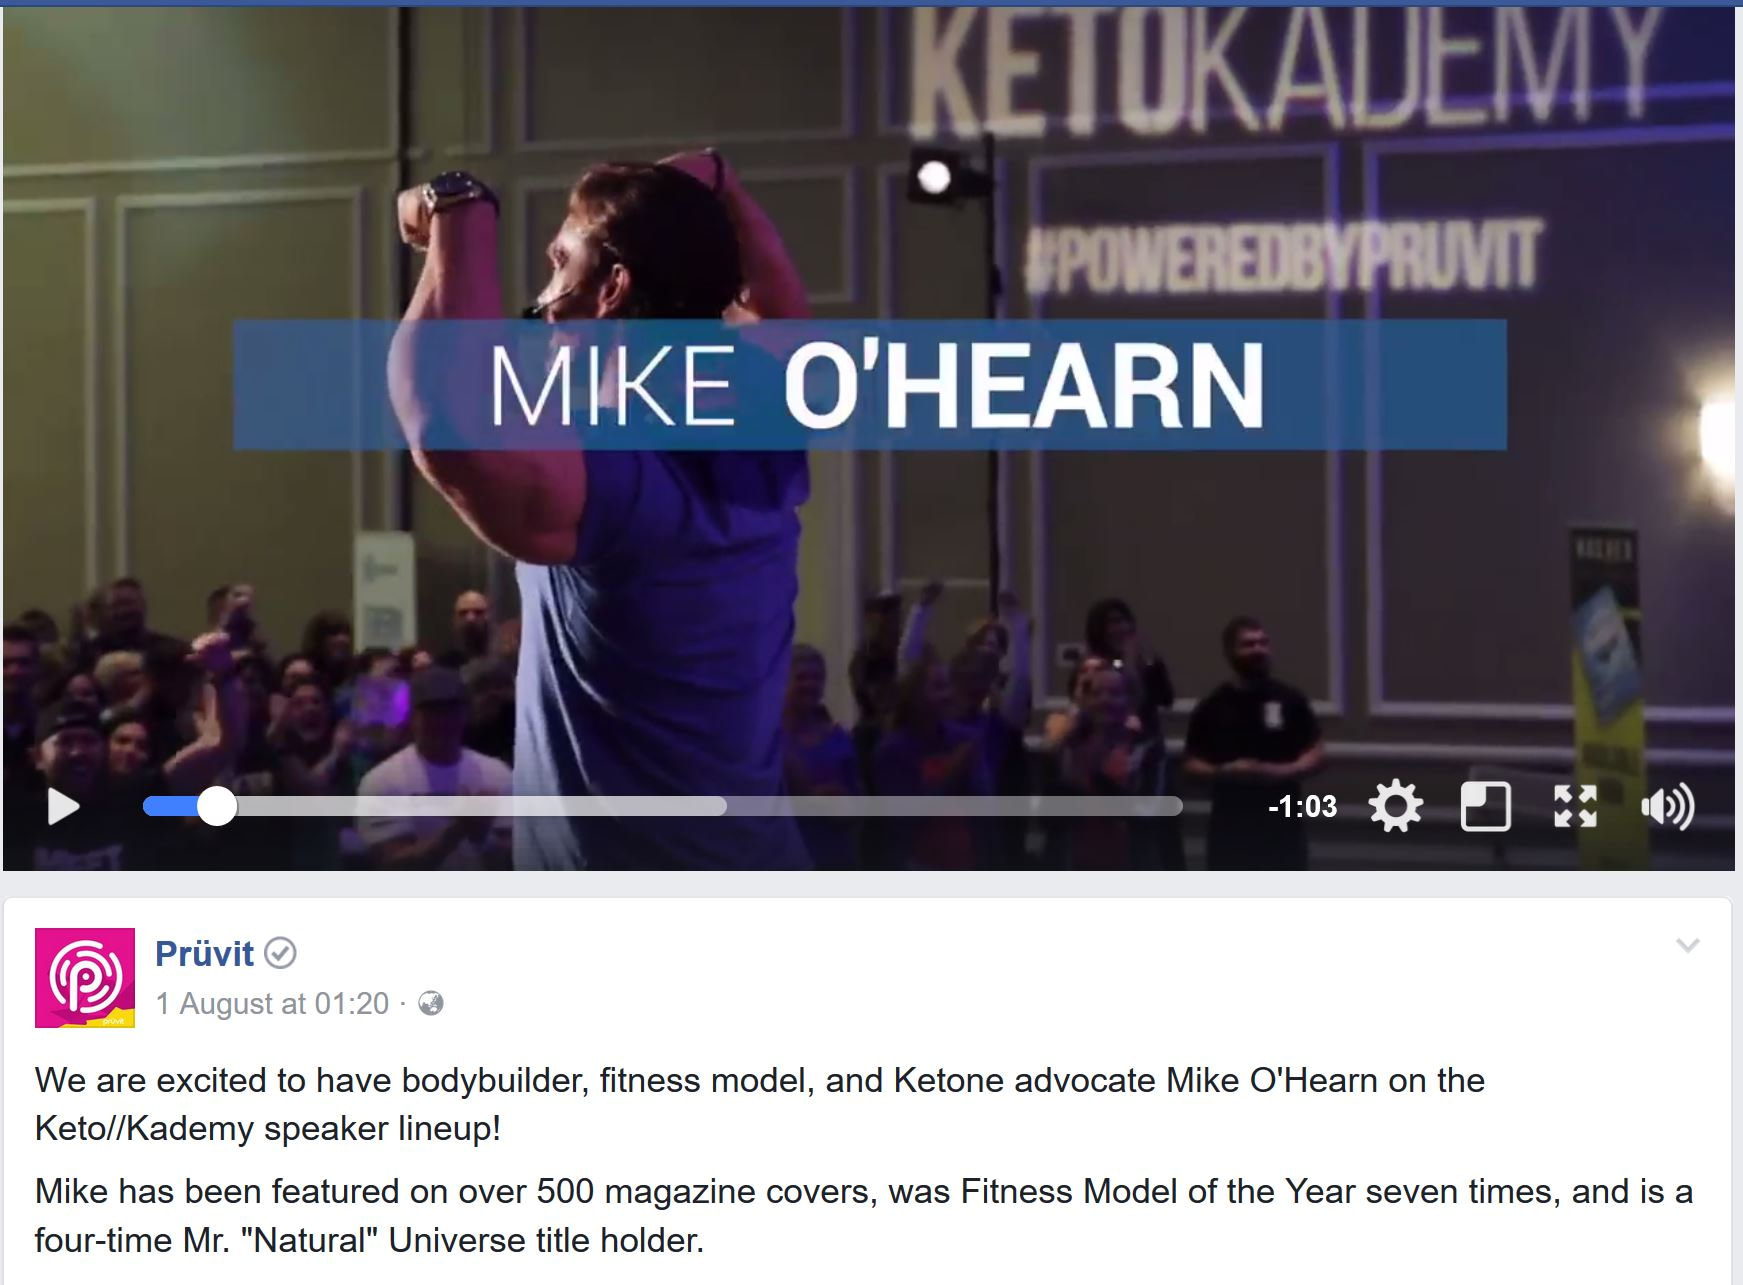 Performance - Bodybuilder - Mike O'Hearn